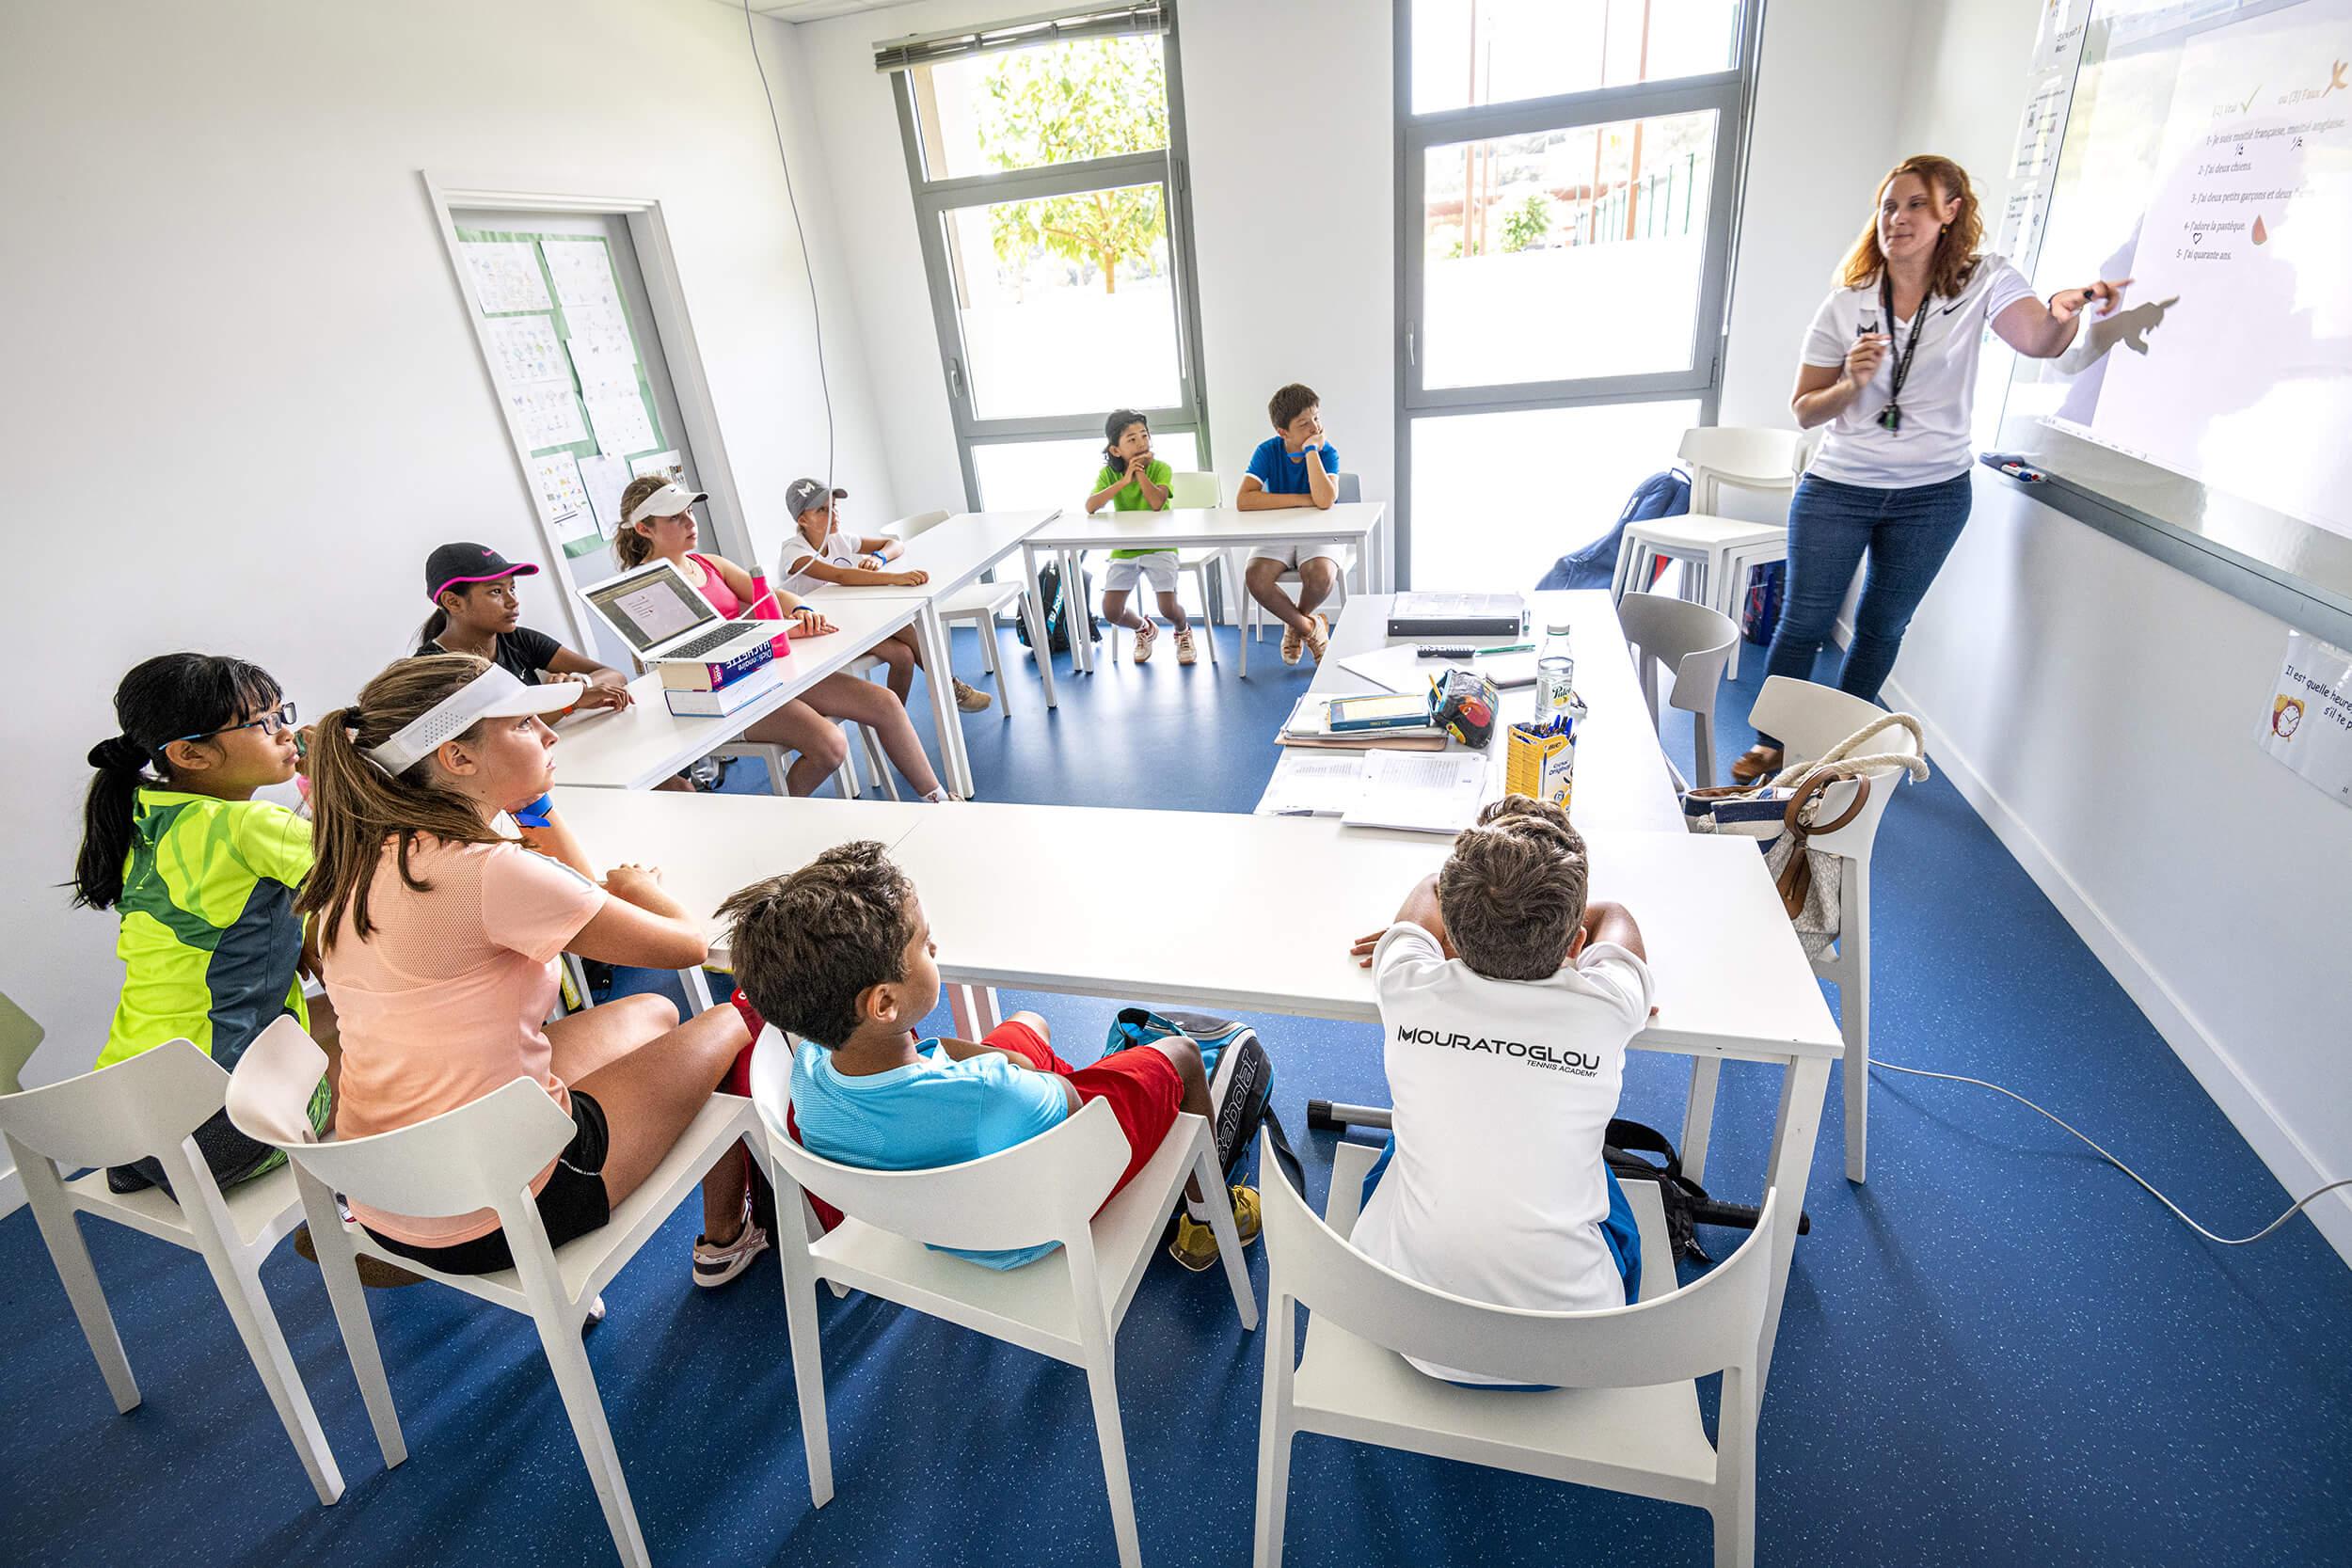 cours-scolaire-classe